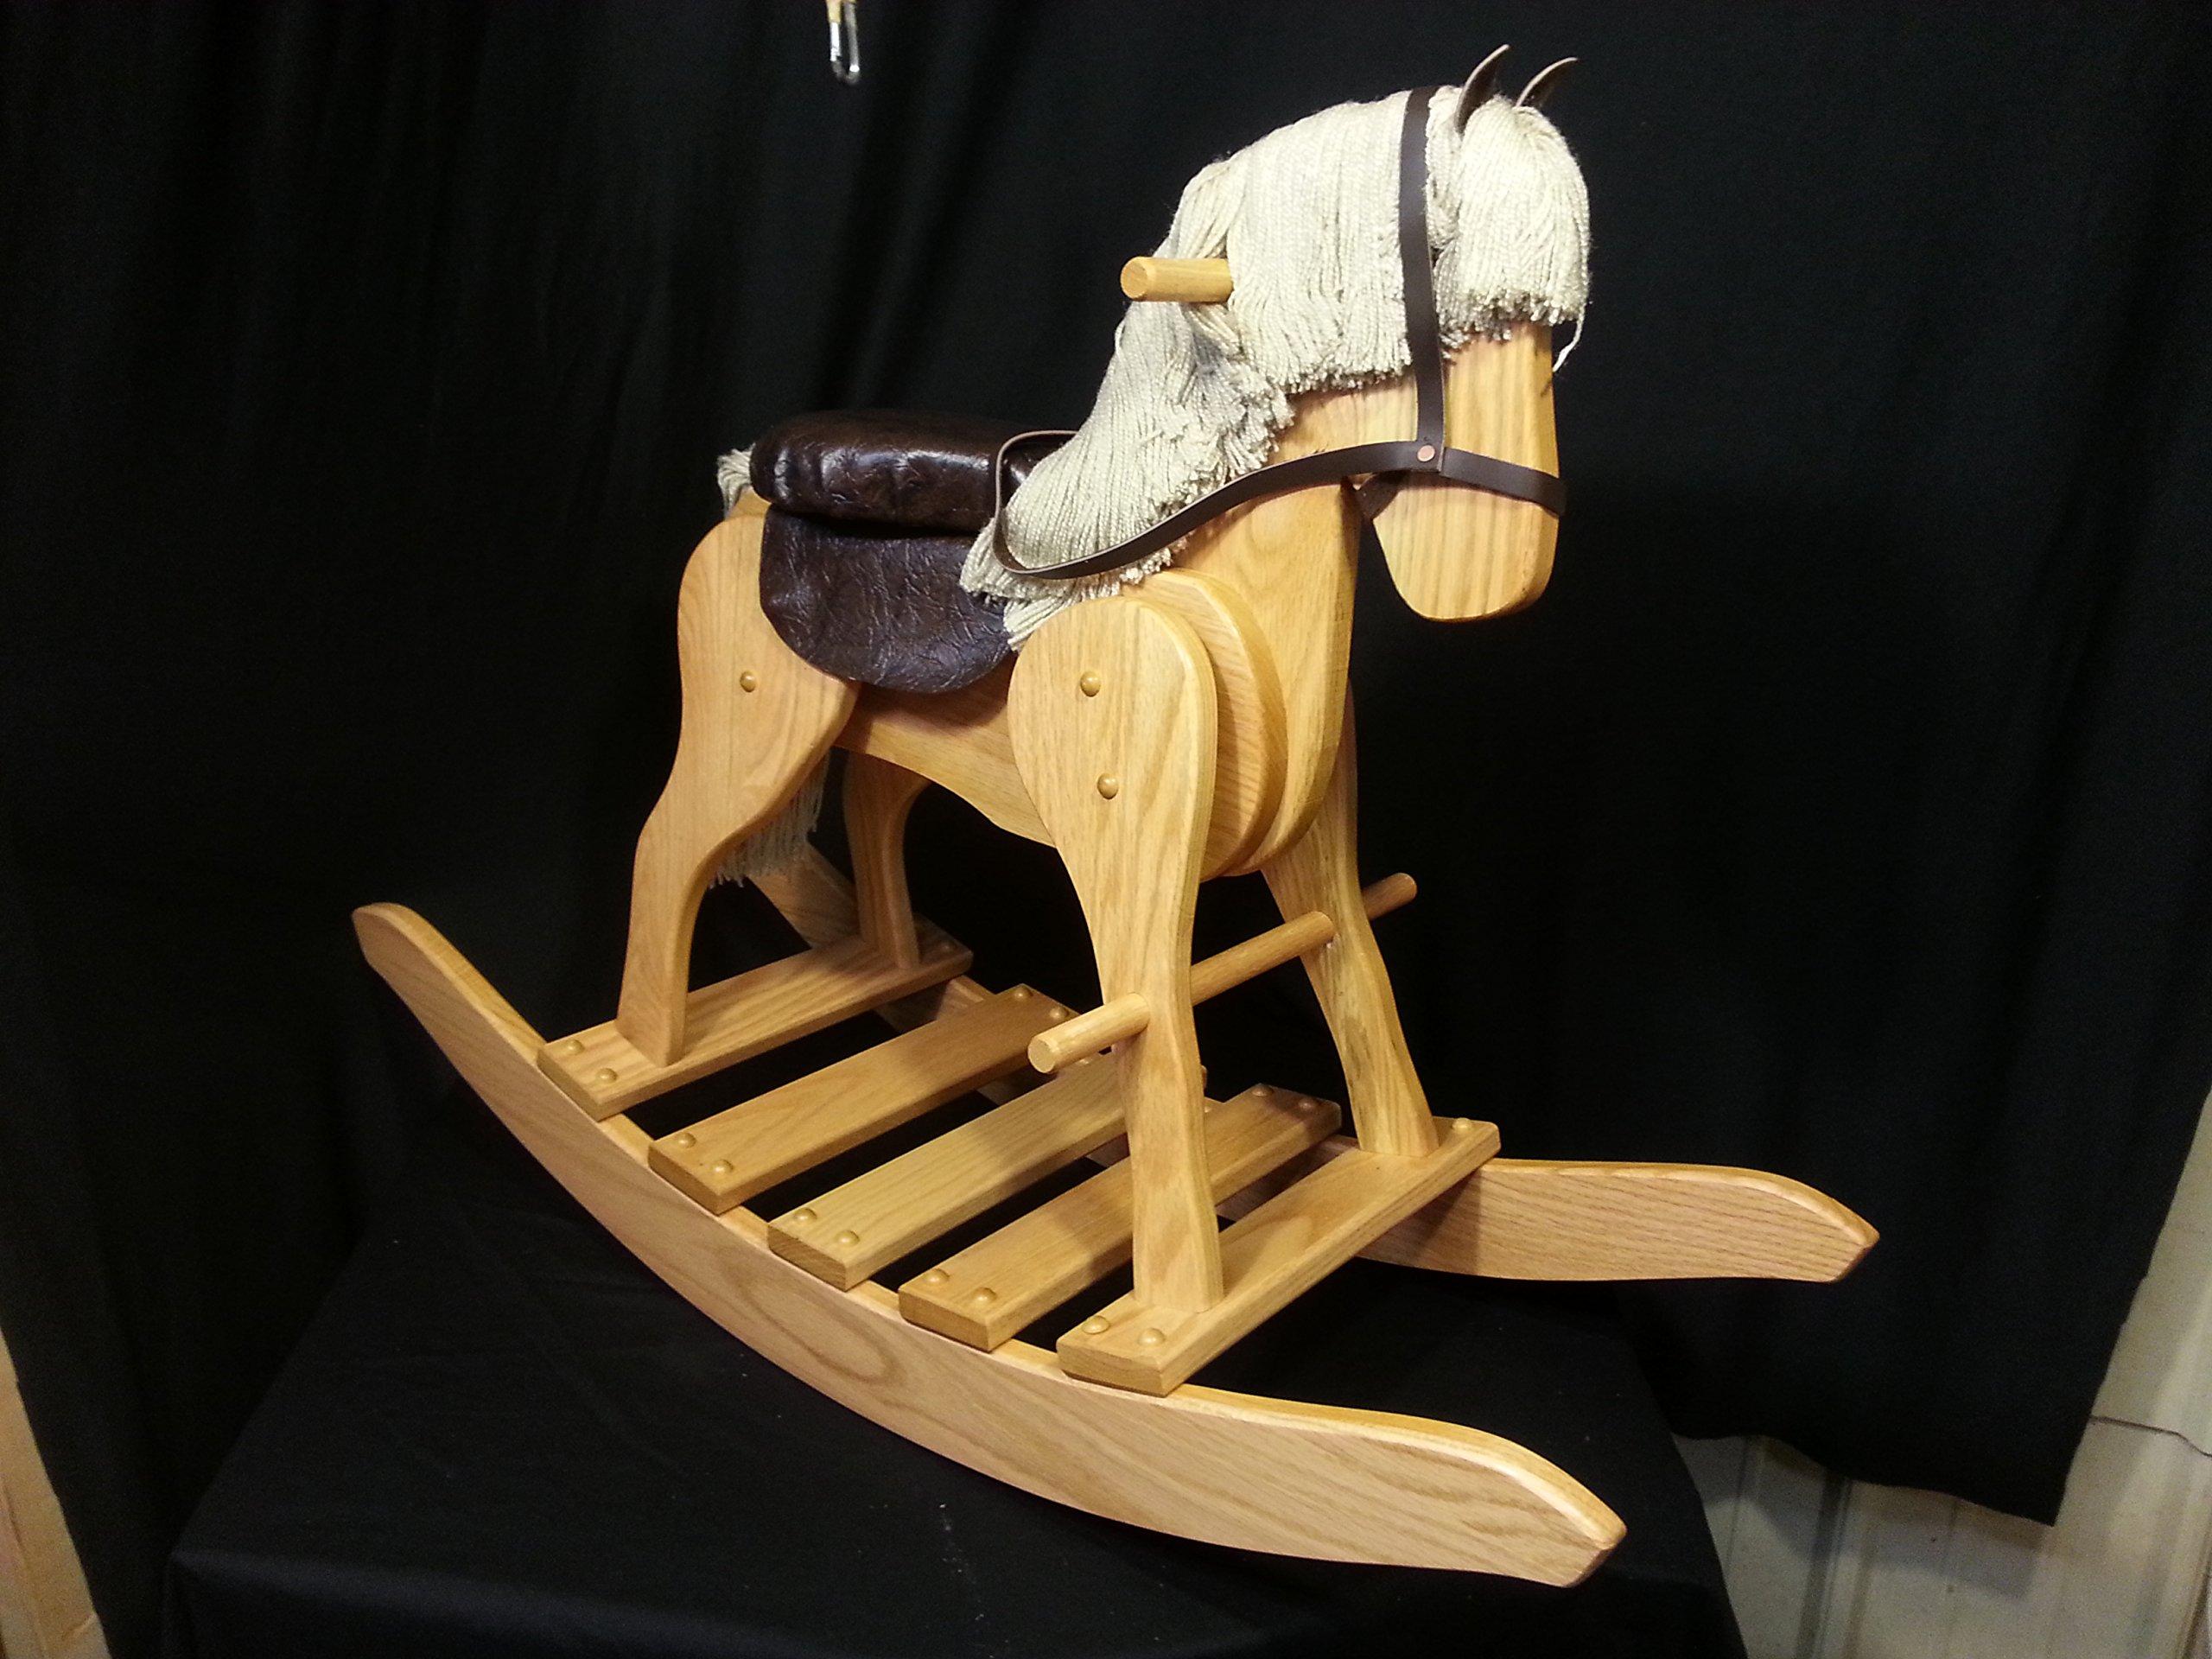 Wooden Medium Rocking Hobby Horse Solid Oak Kids Toy Golden Oak Stain